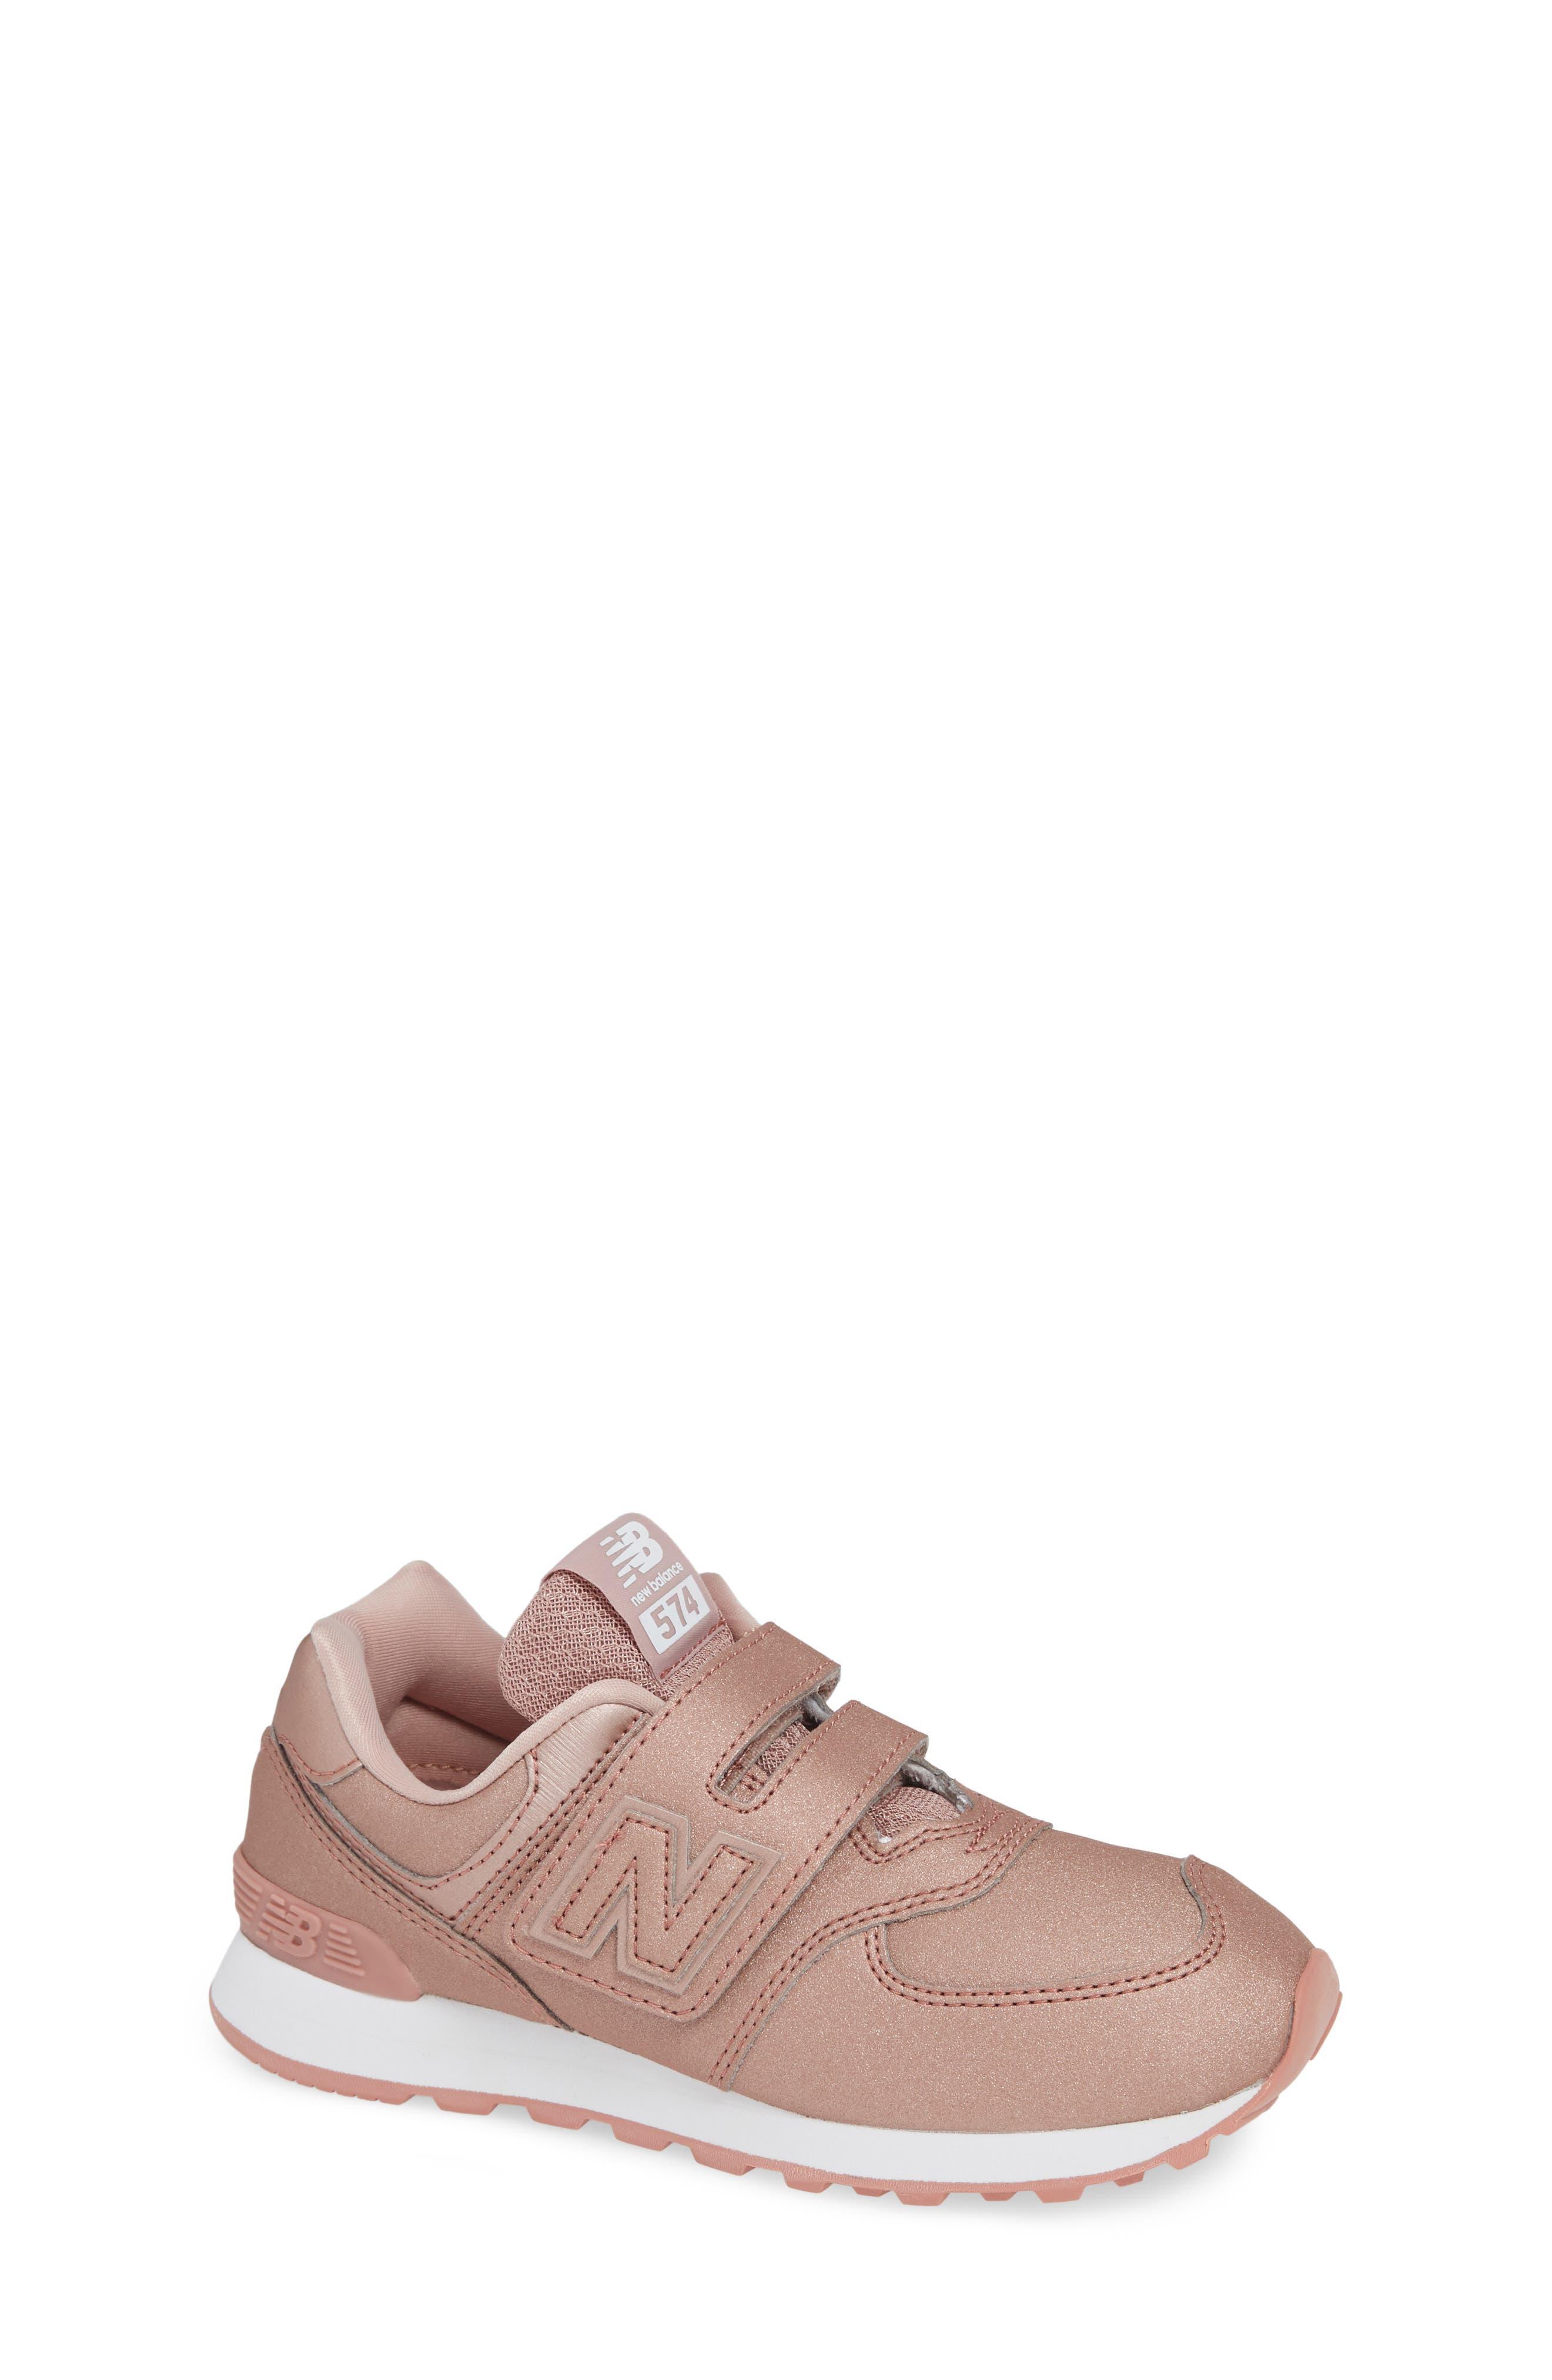 Girls New Balance 574 Essentials Glitter Sneaker Size 13 M  Metallic